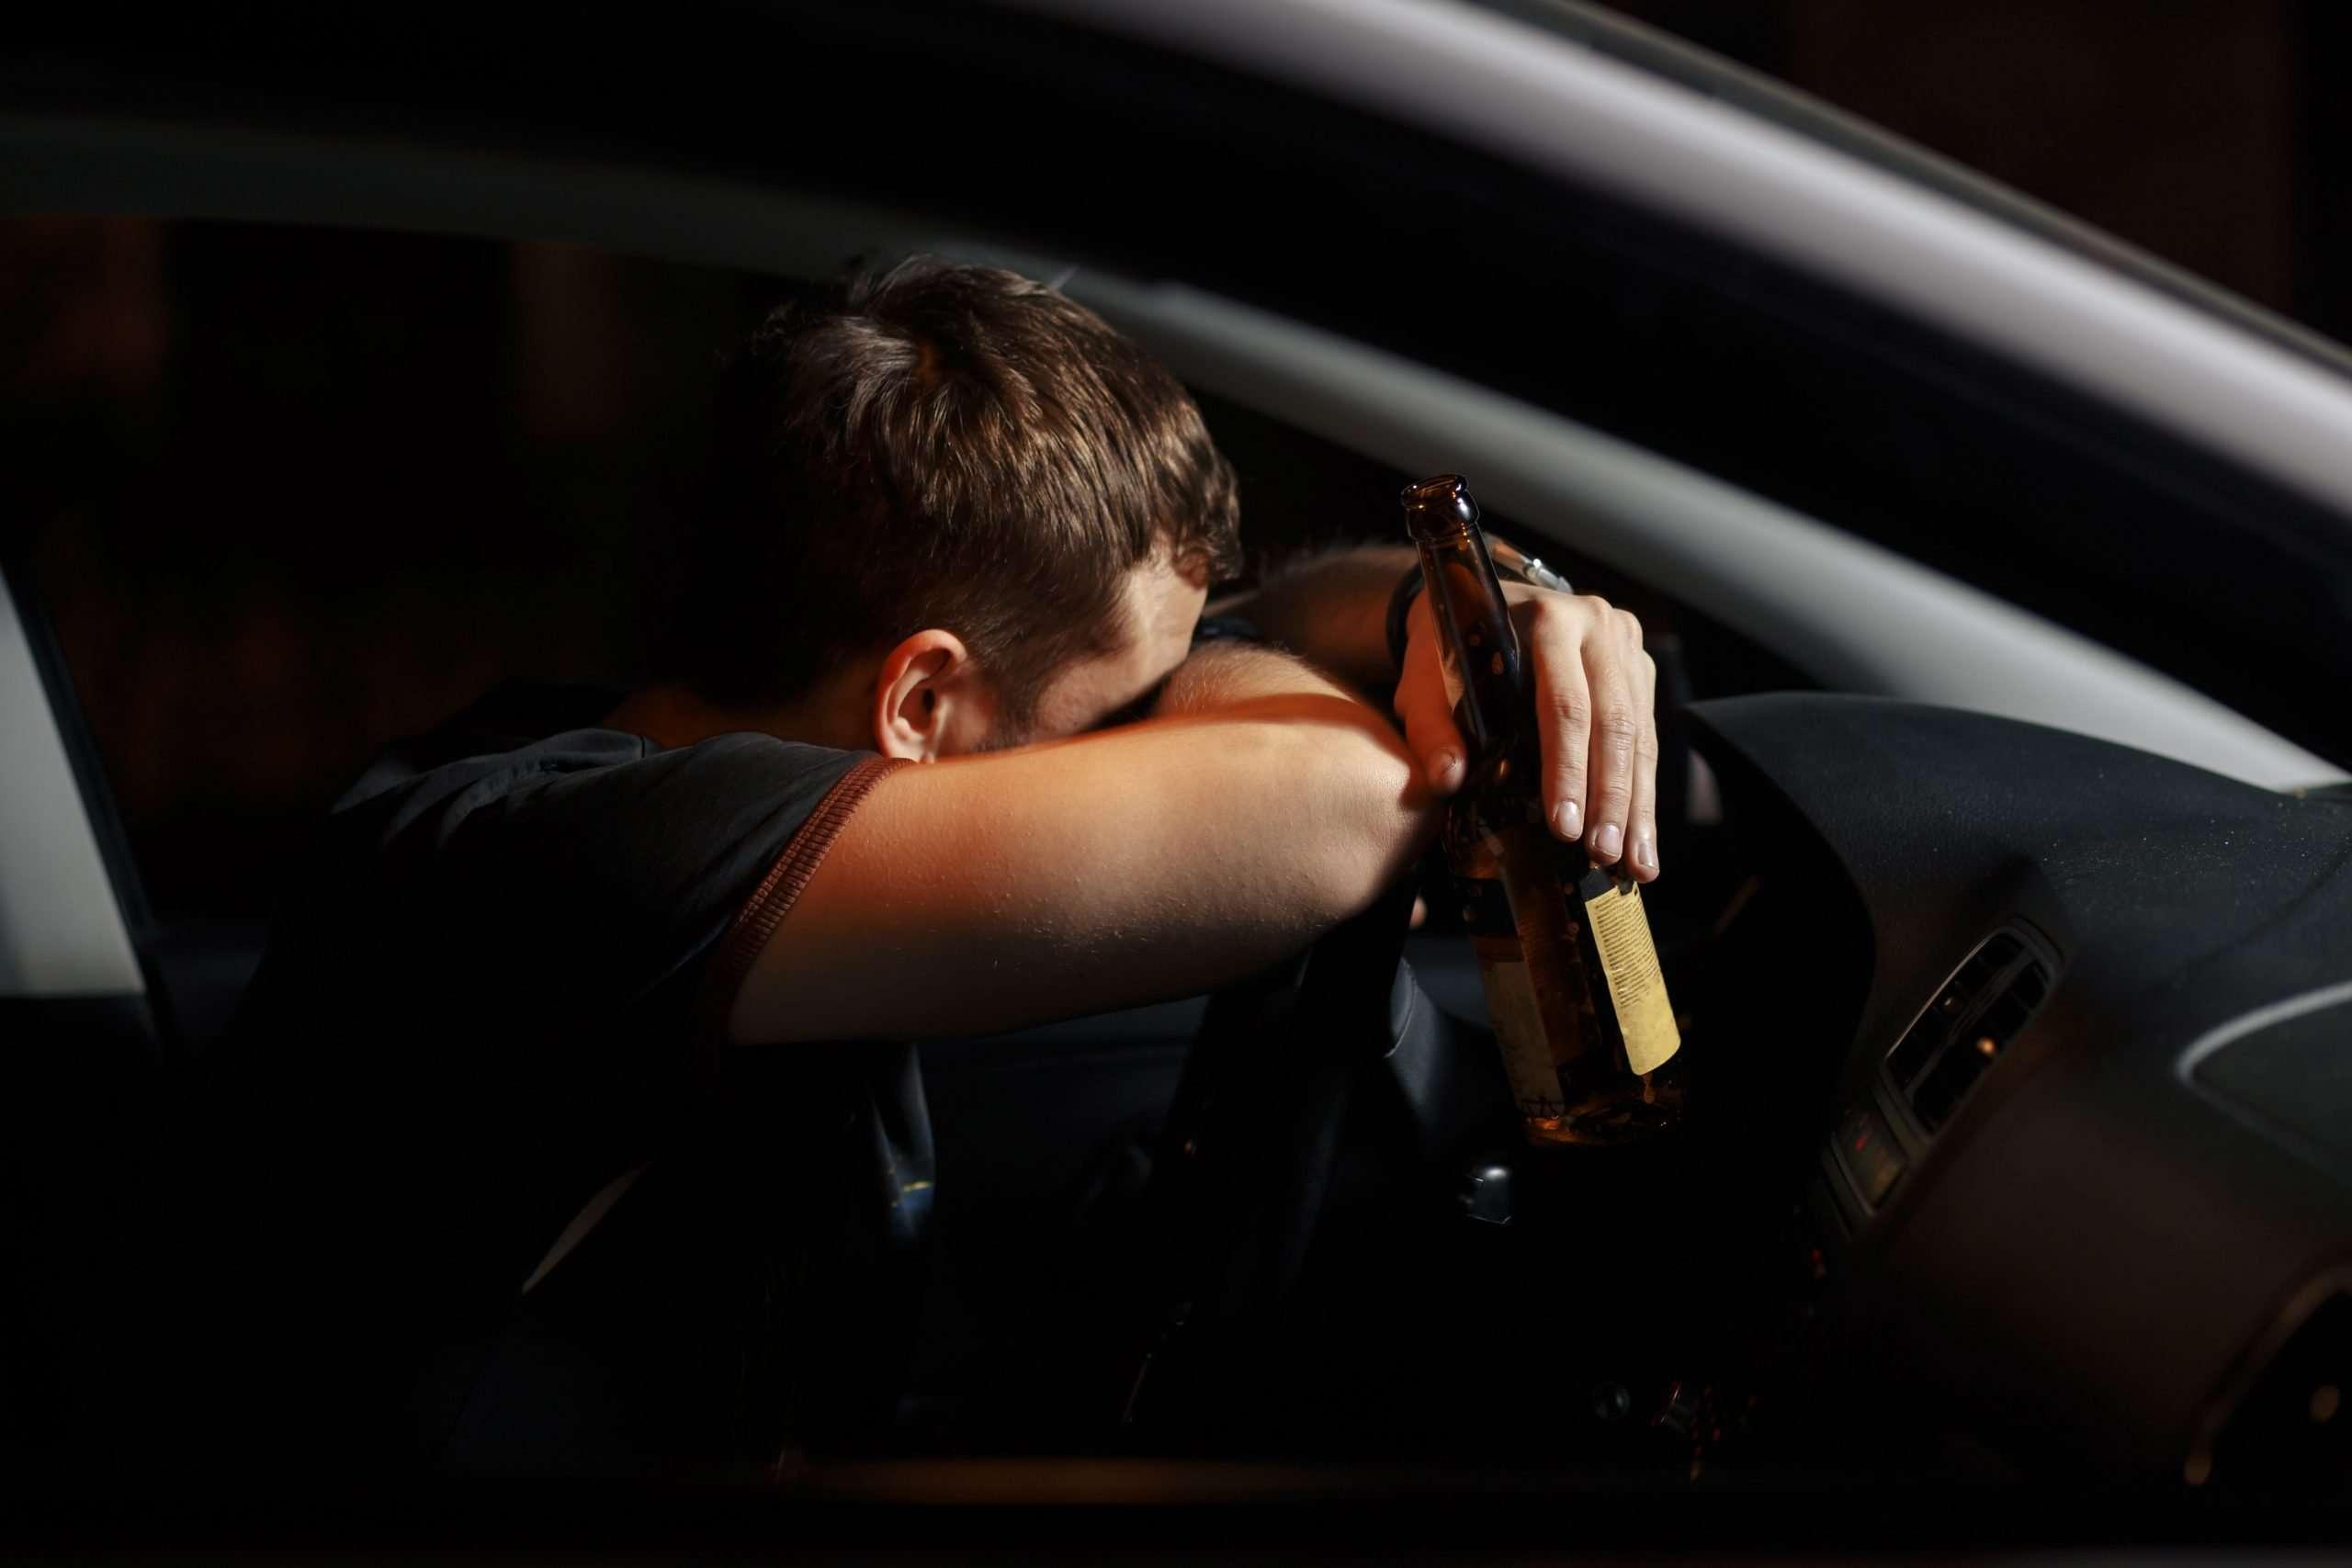 AdobeStock_206051153 - drunk driver